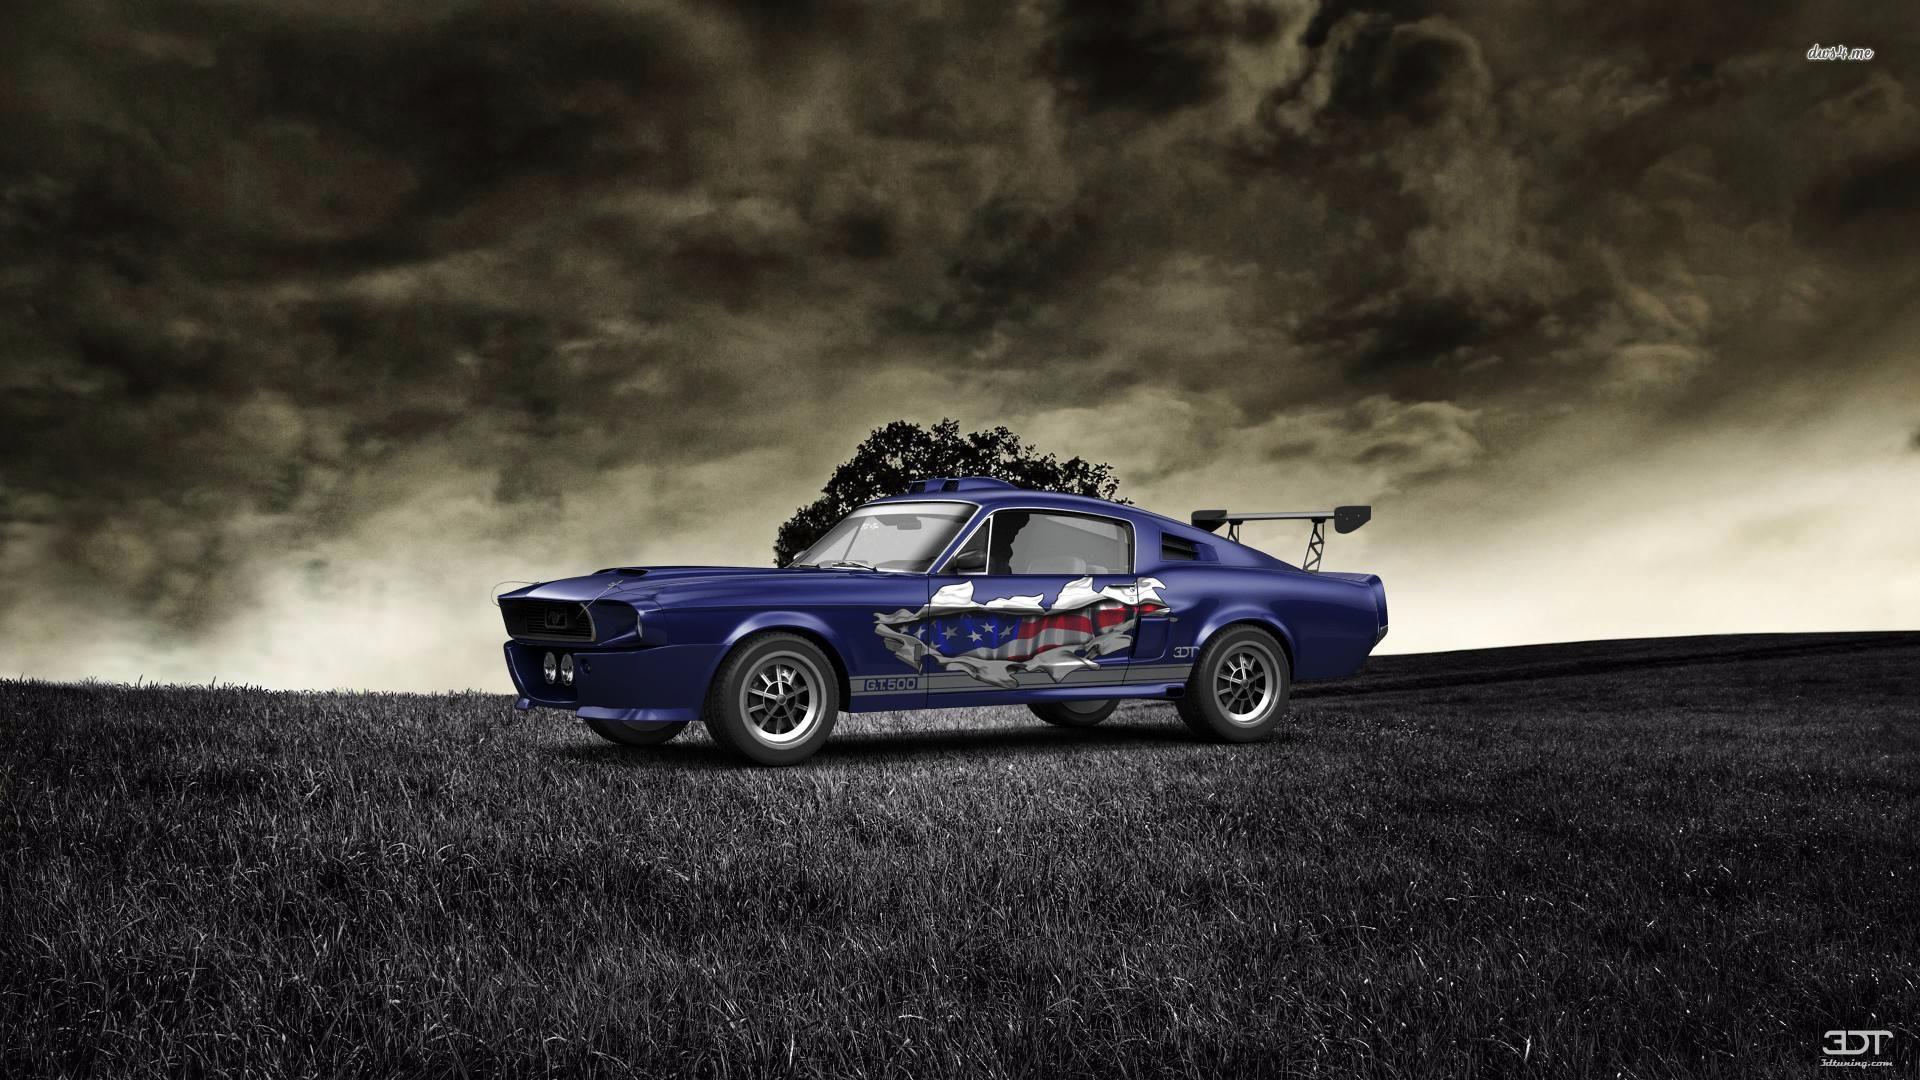 Checkout my tuning Mustang ShelbyGT500 1967 at 3DTuning 3dtuning